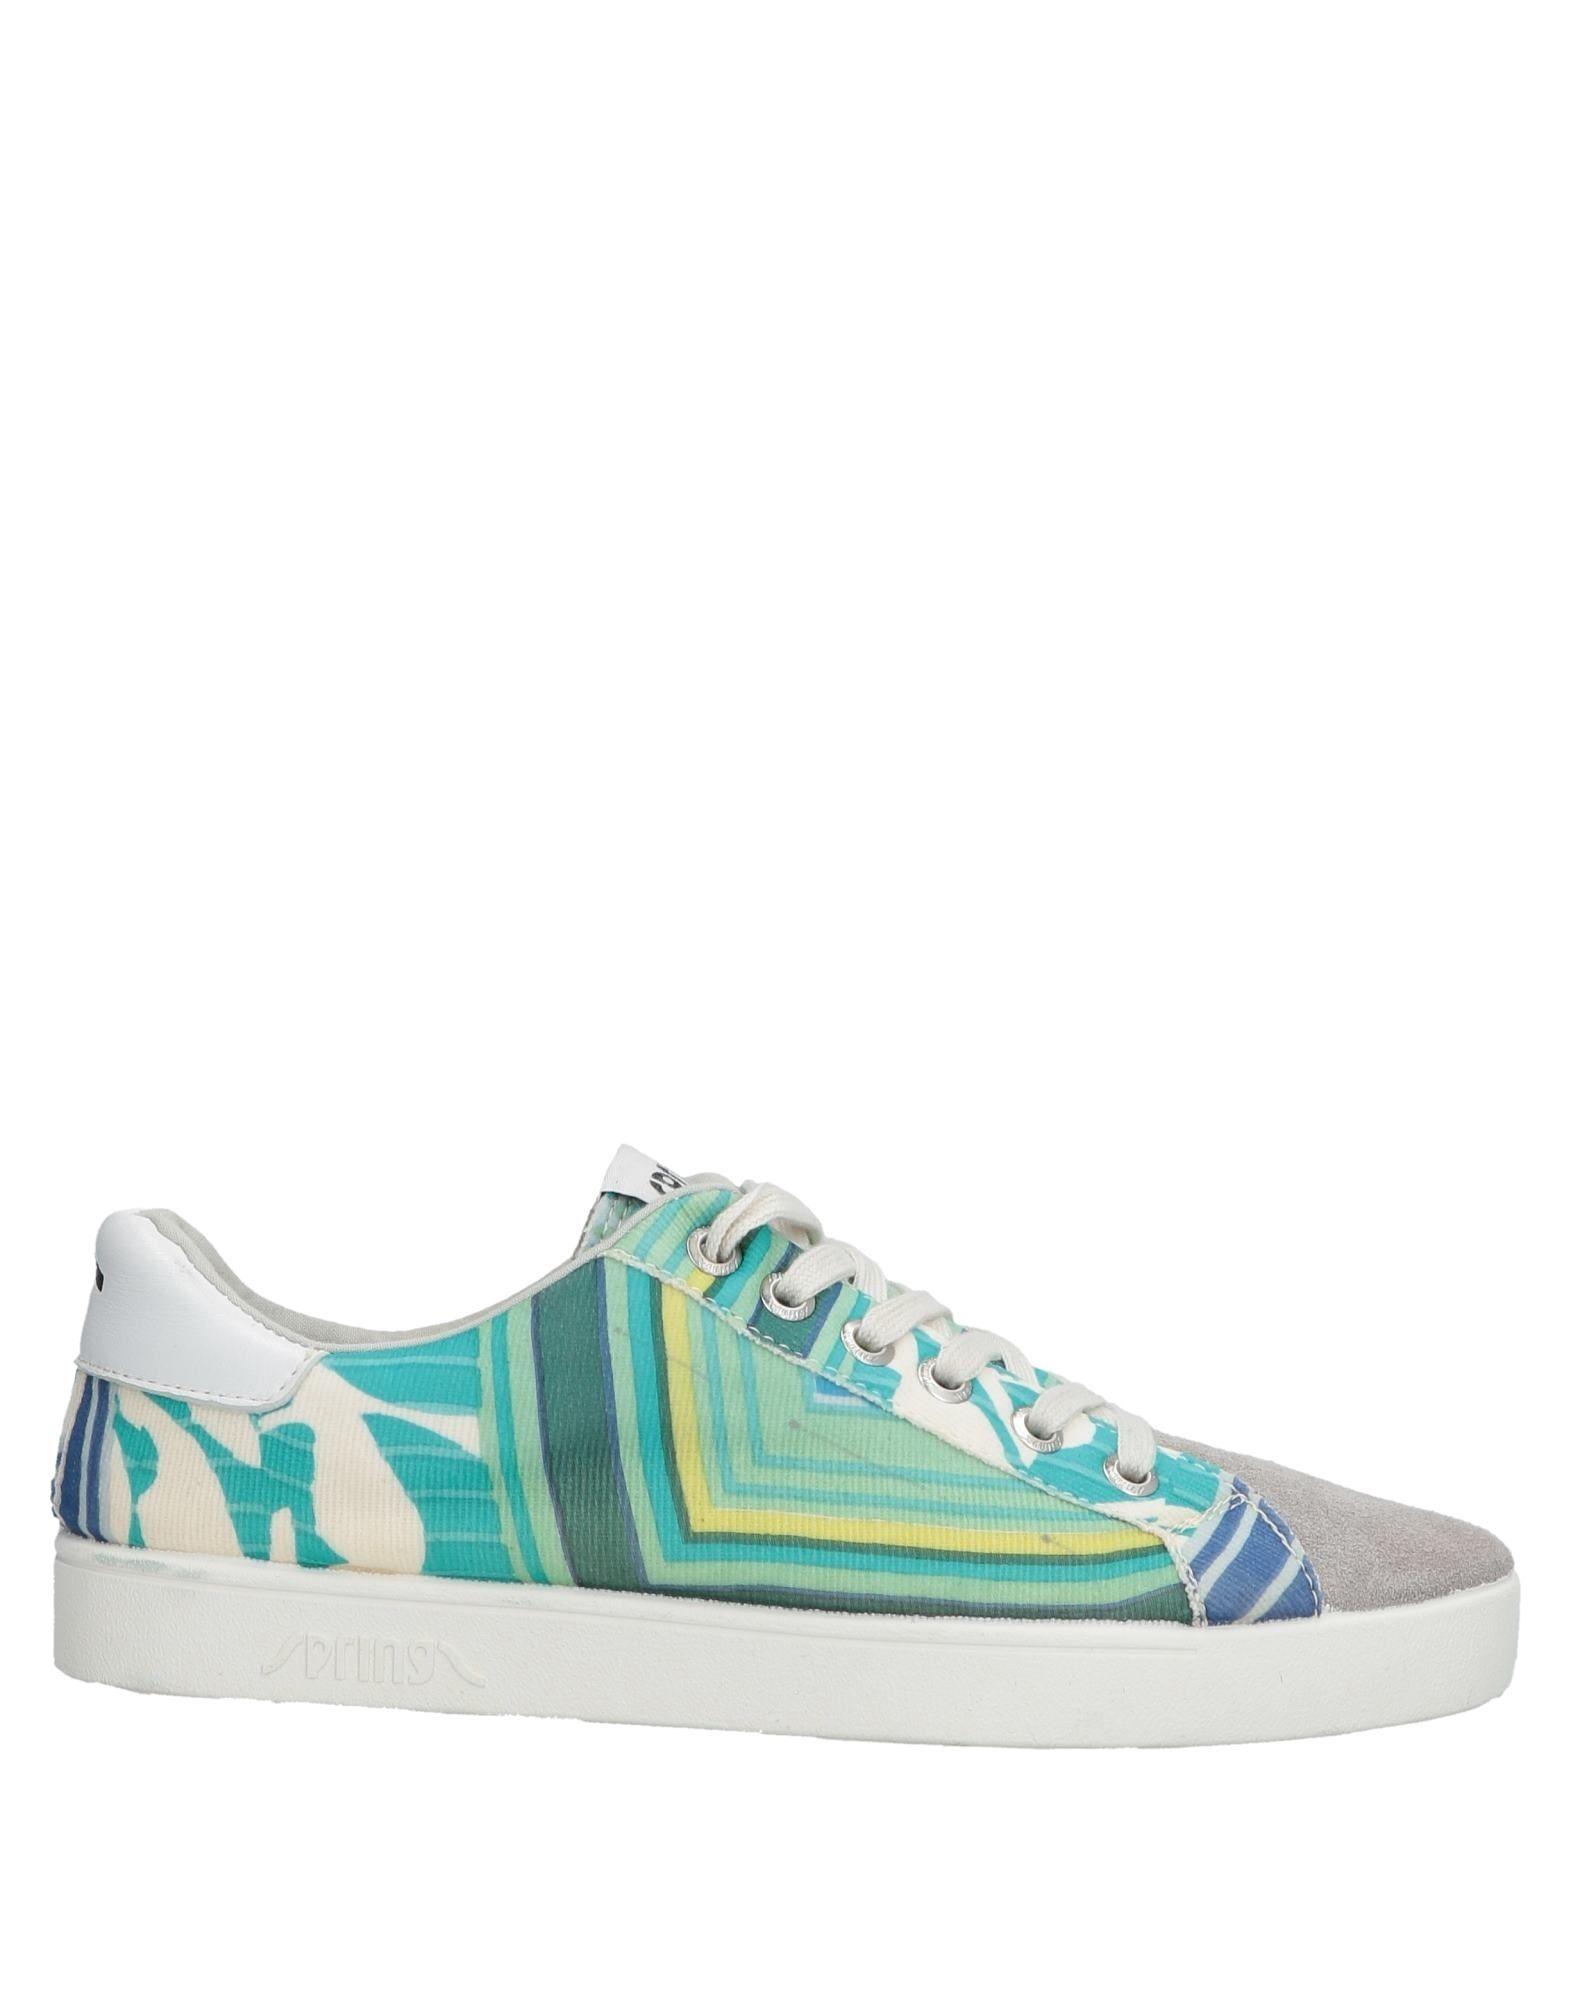 Springa on Sneakers - Women Springa Sneakers online on Springa  Canada - 11574465UR adc8d8